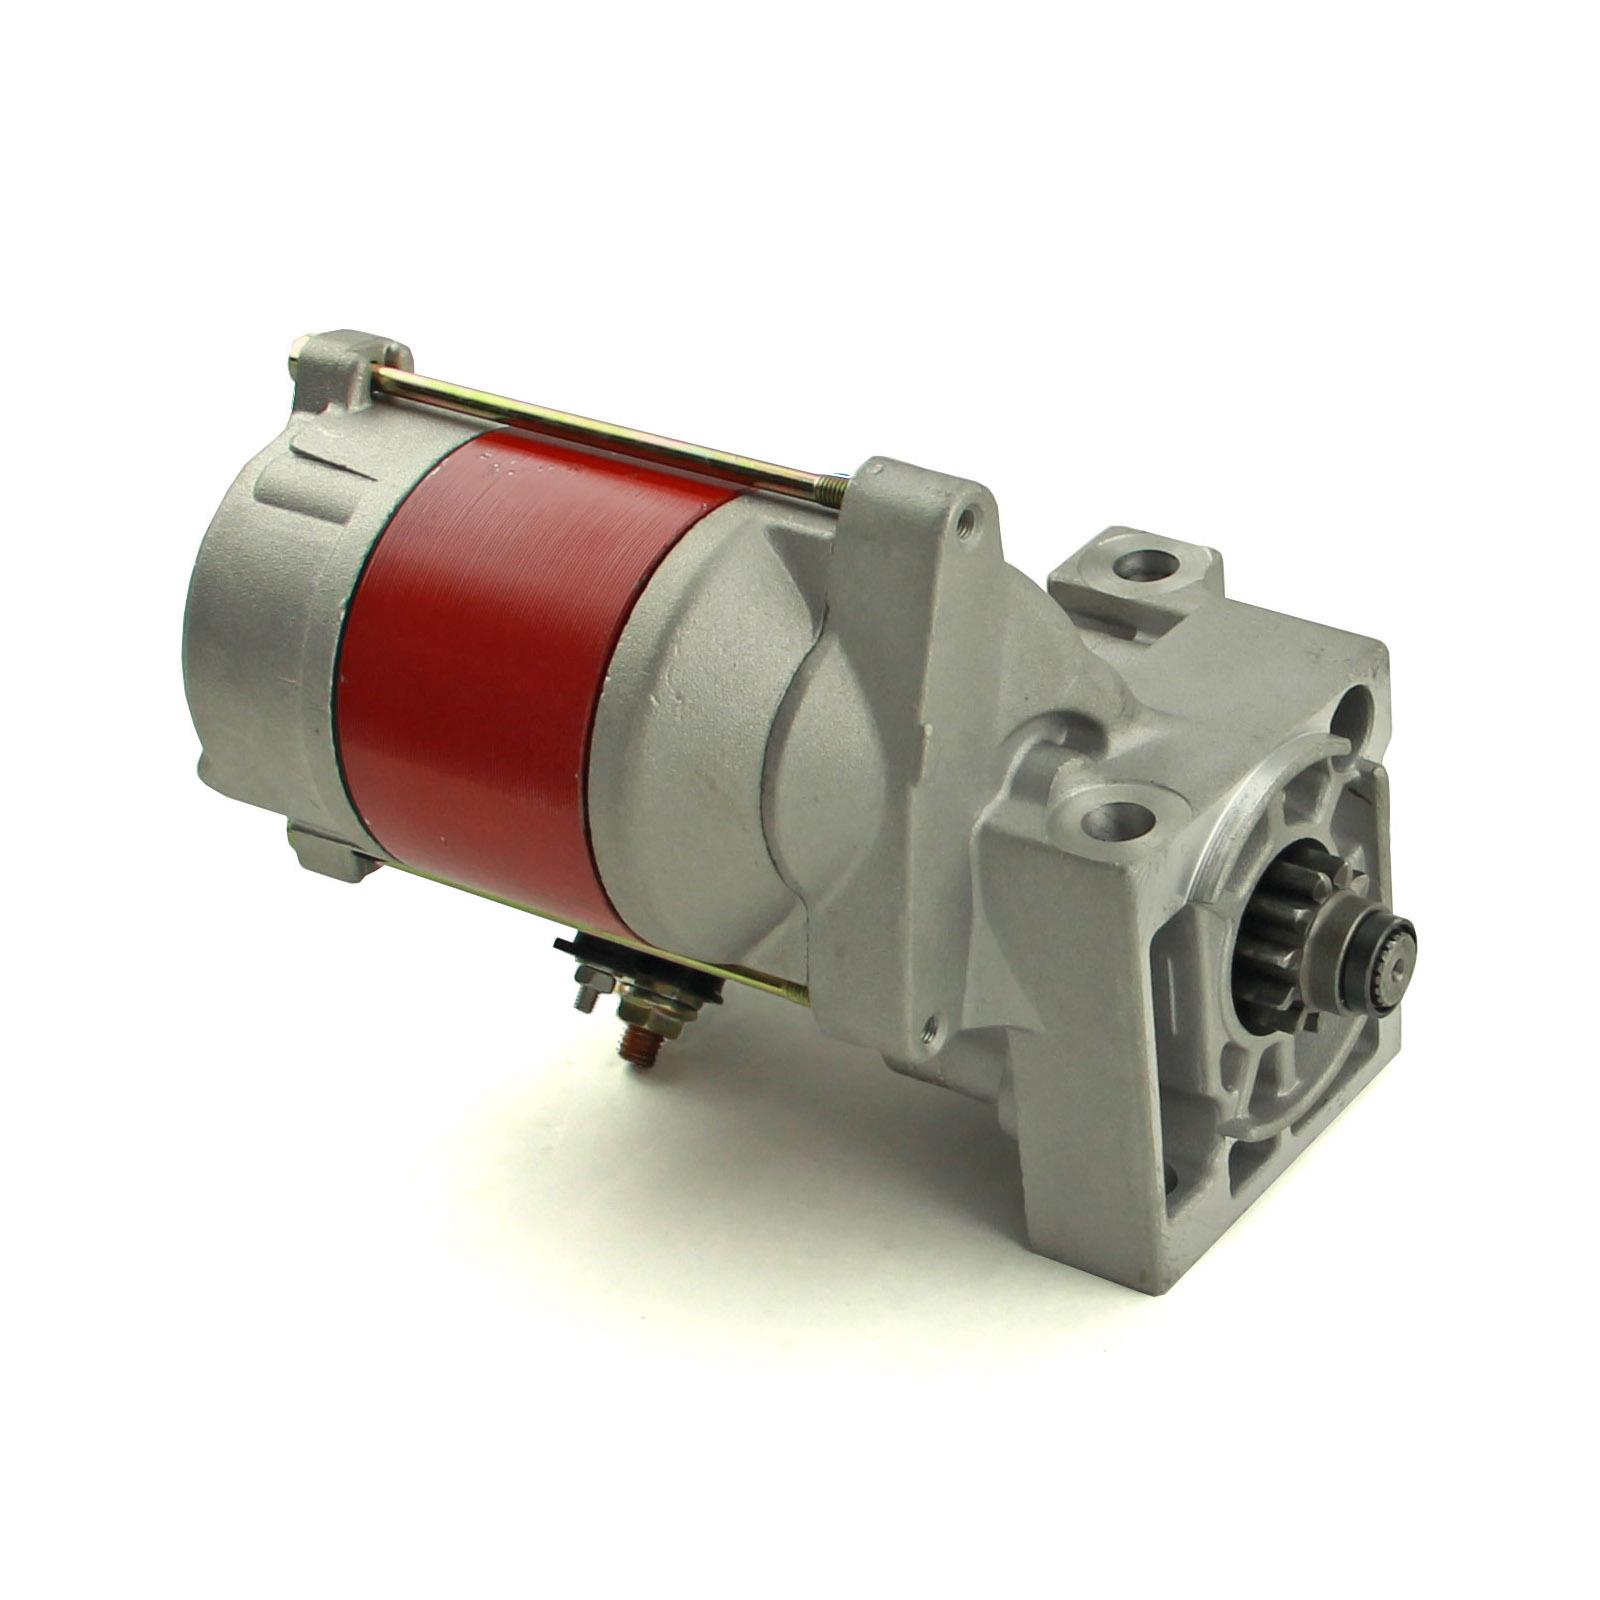 Chevy Sbc 350 Bbc 454 11 U0026quot  168t Offset 2 5hp High Torque